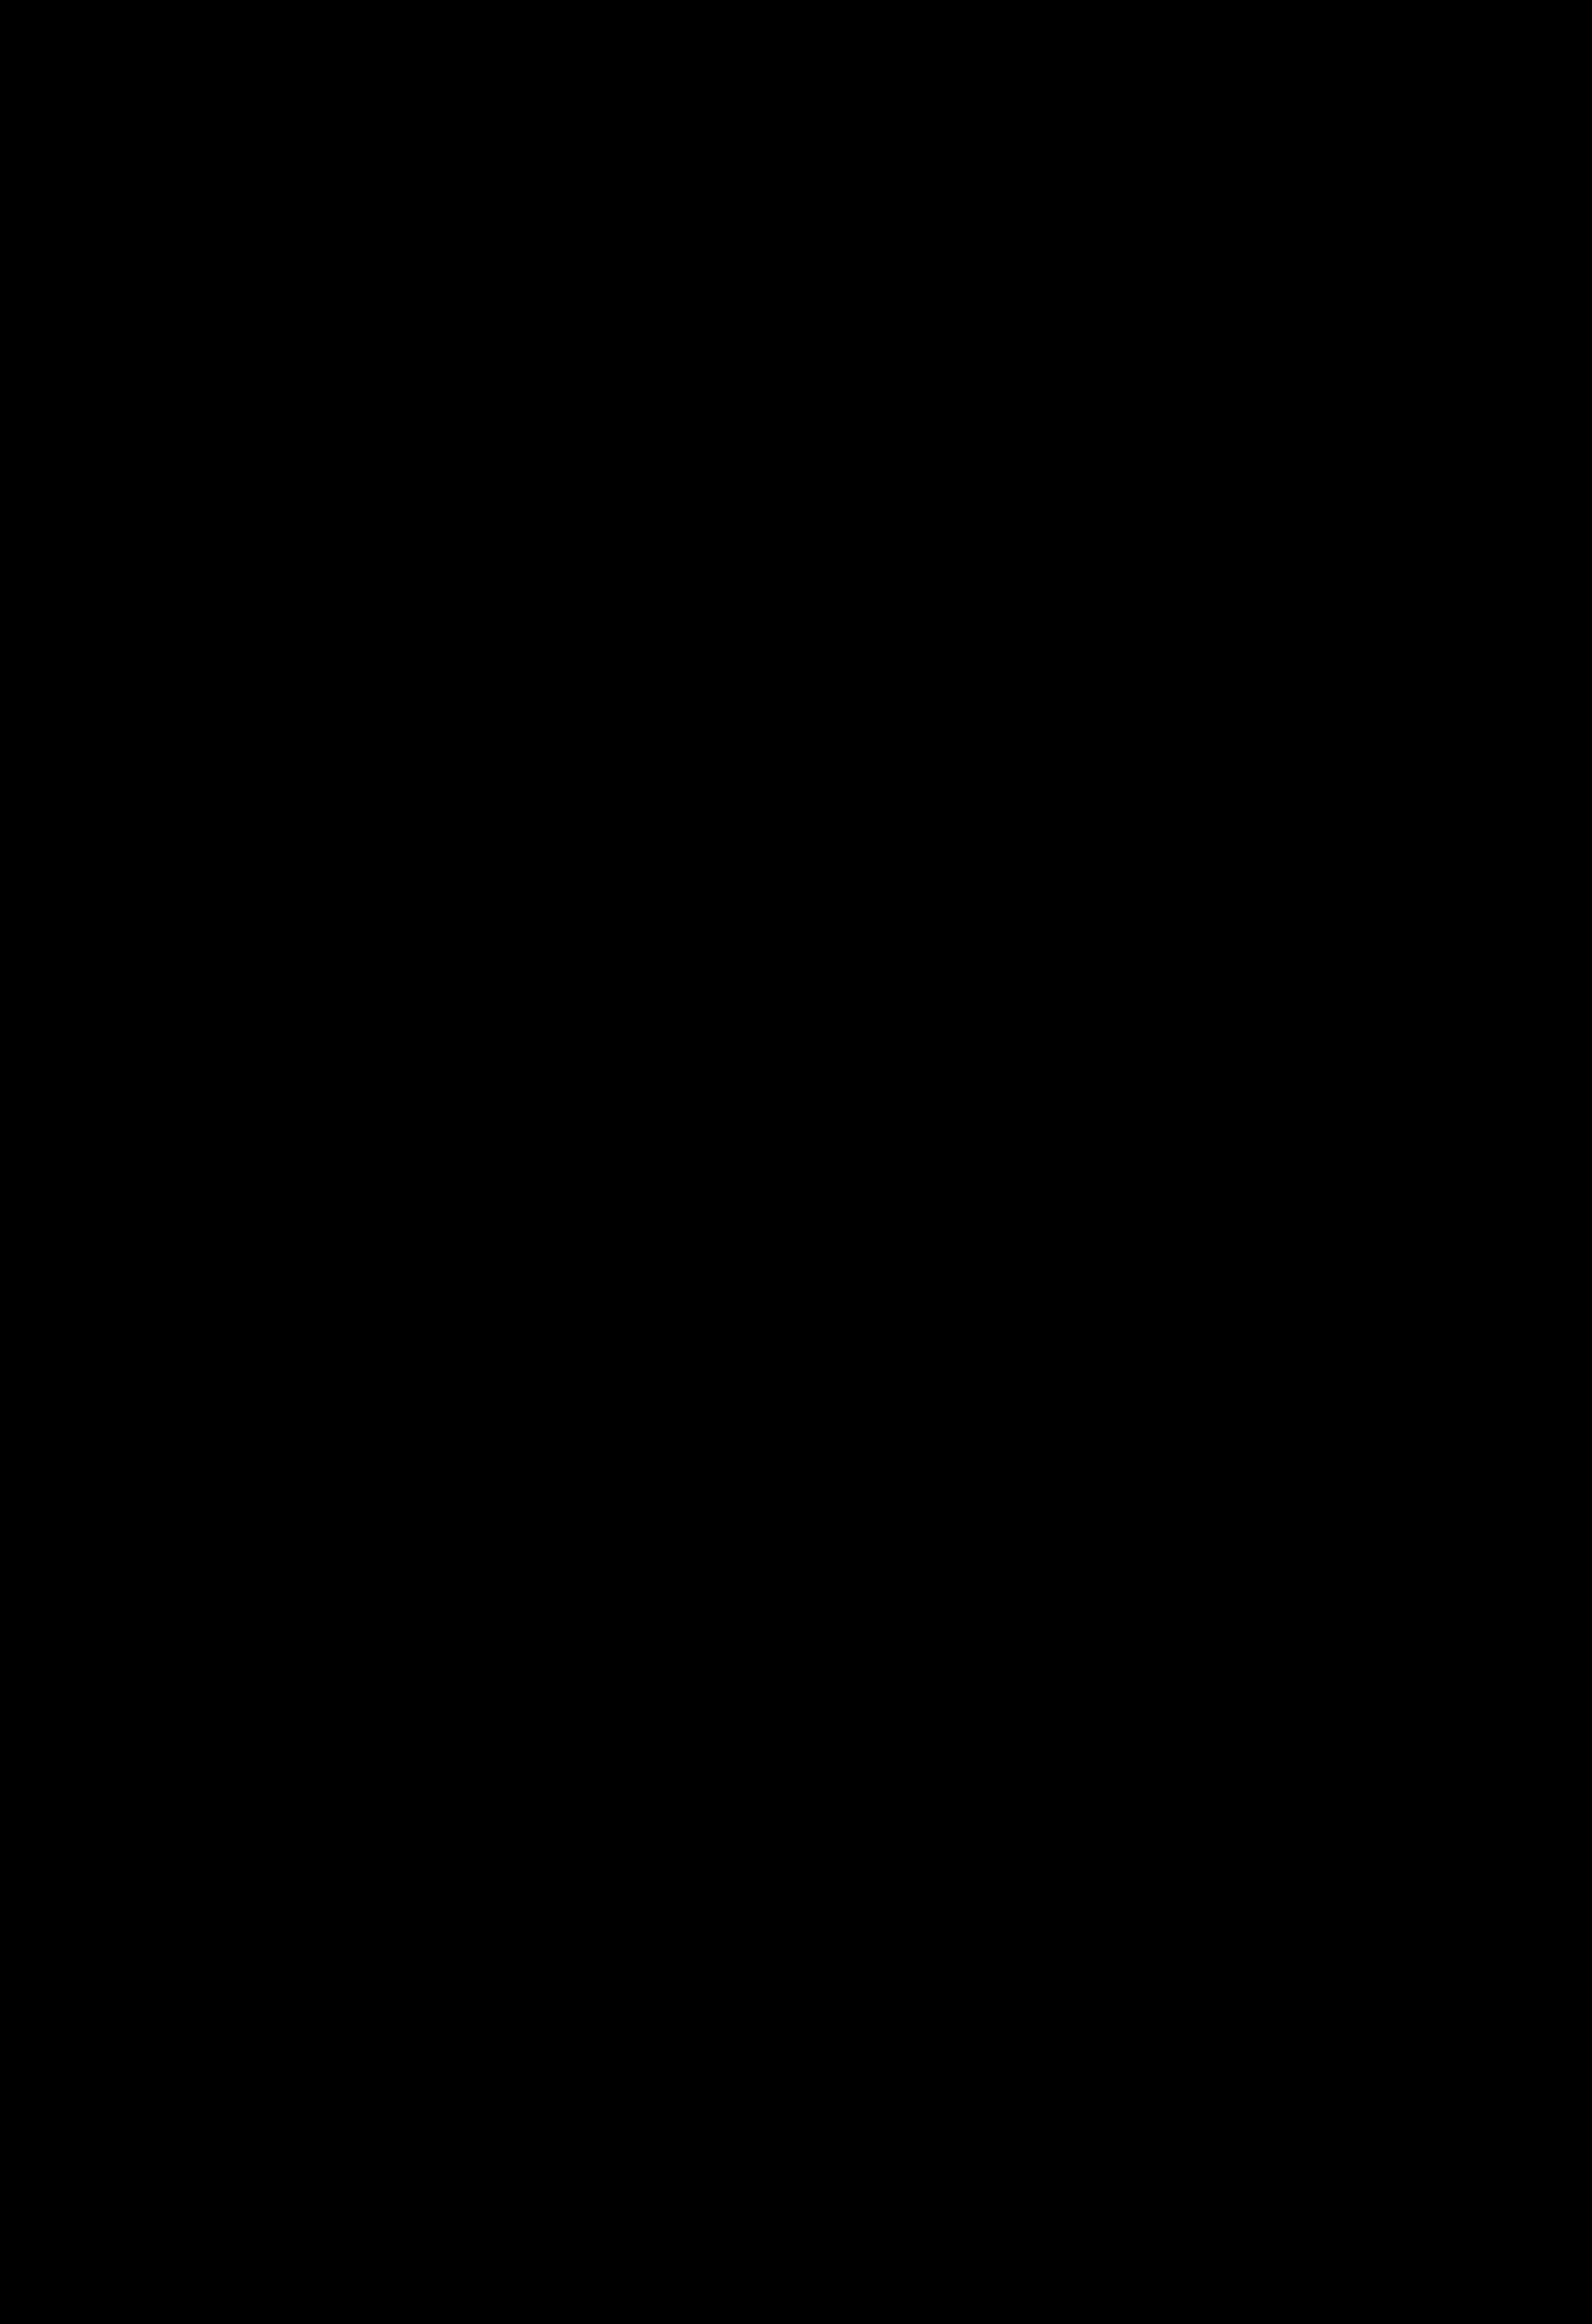 WCM0016.png